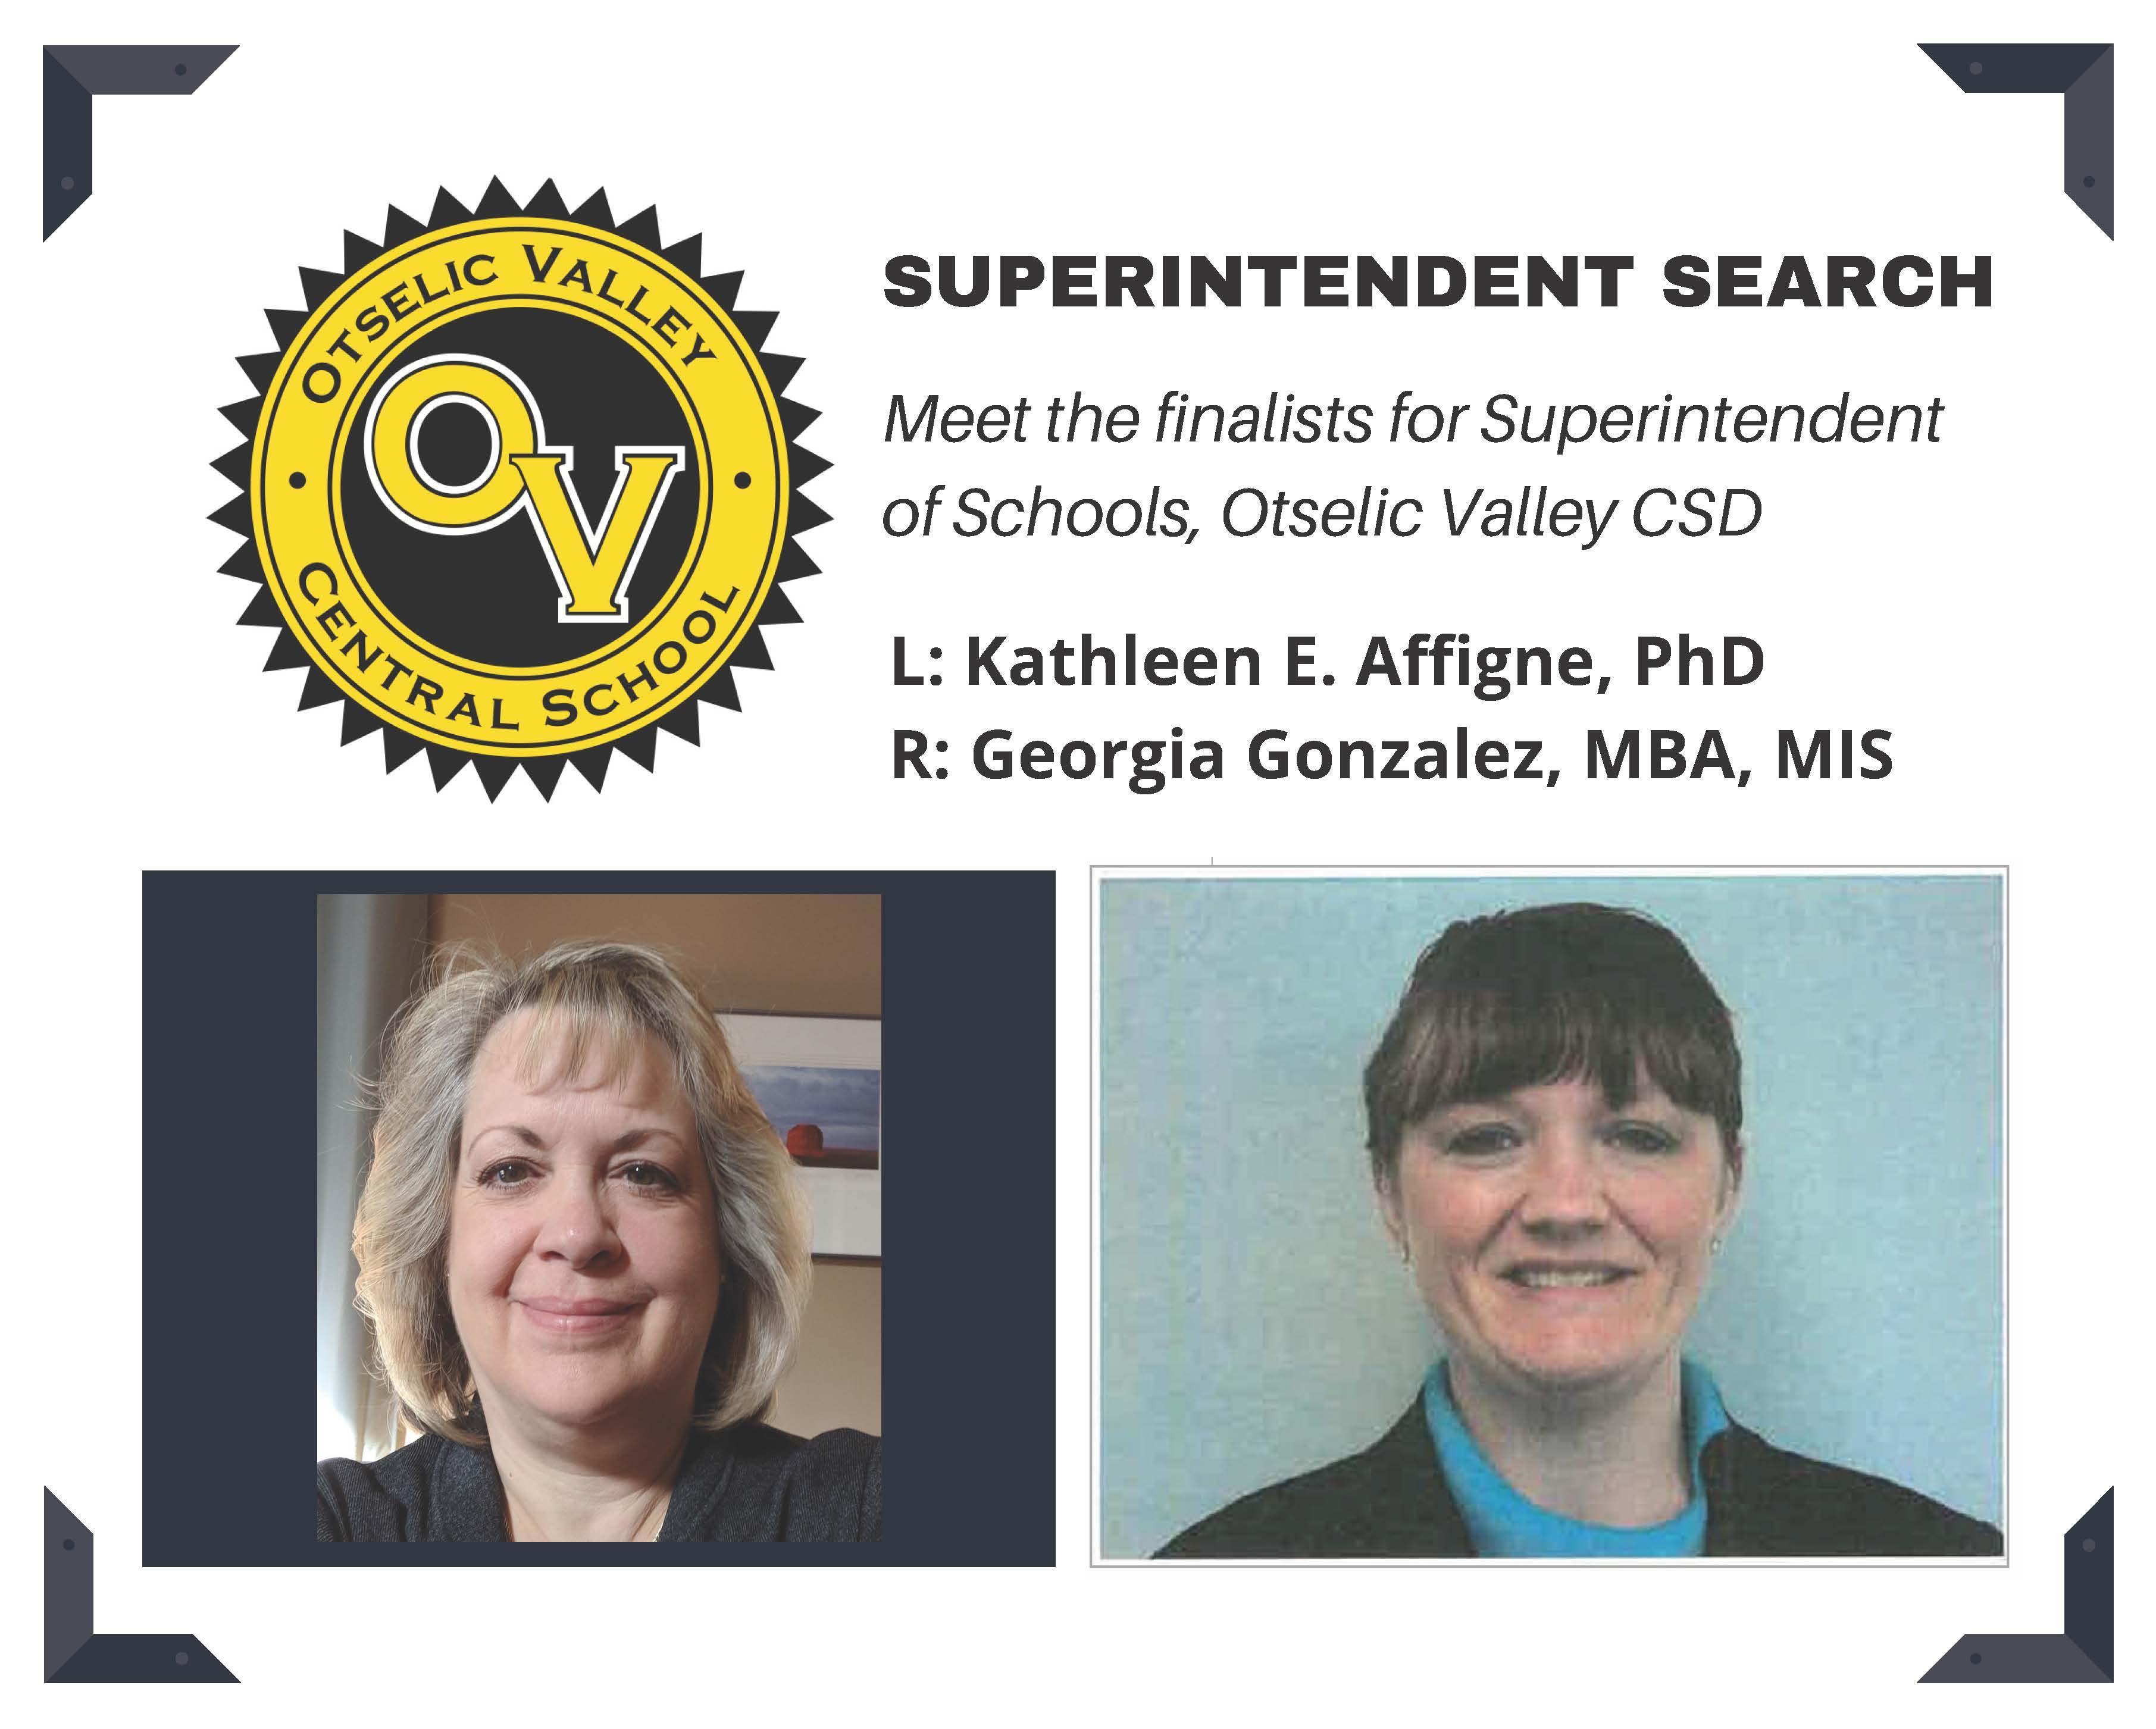 Superintendent Search Meet the finalists for Superintendent of Schools, Otselic Valley CSD.  Left: Kathleen E. Affigne, PhD. Right: Georgia Gonzalez, MBA, MIS. Otselic Valley Central Schools Logo